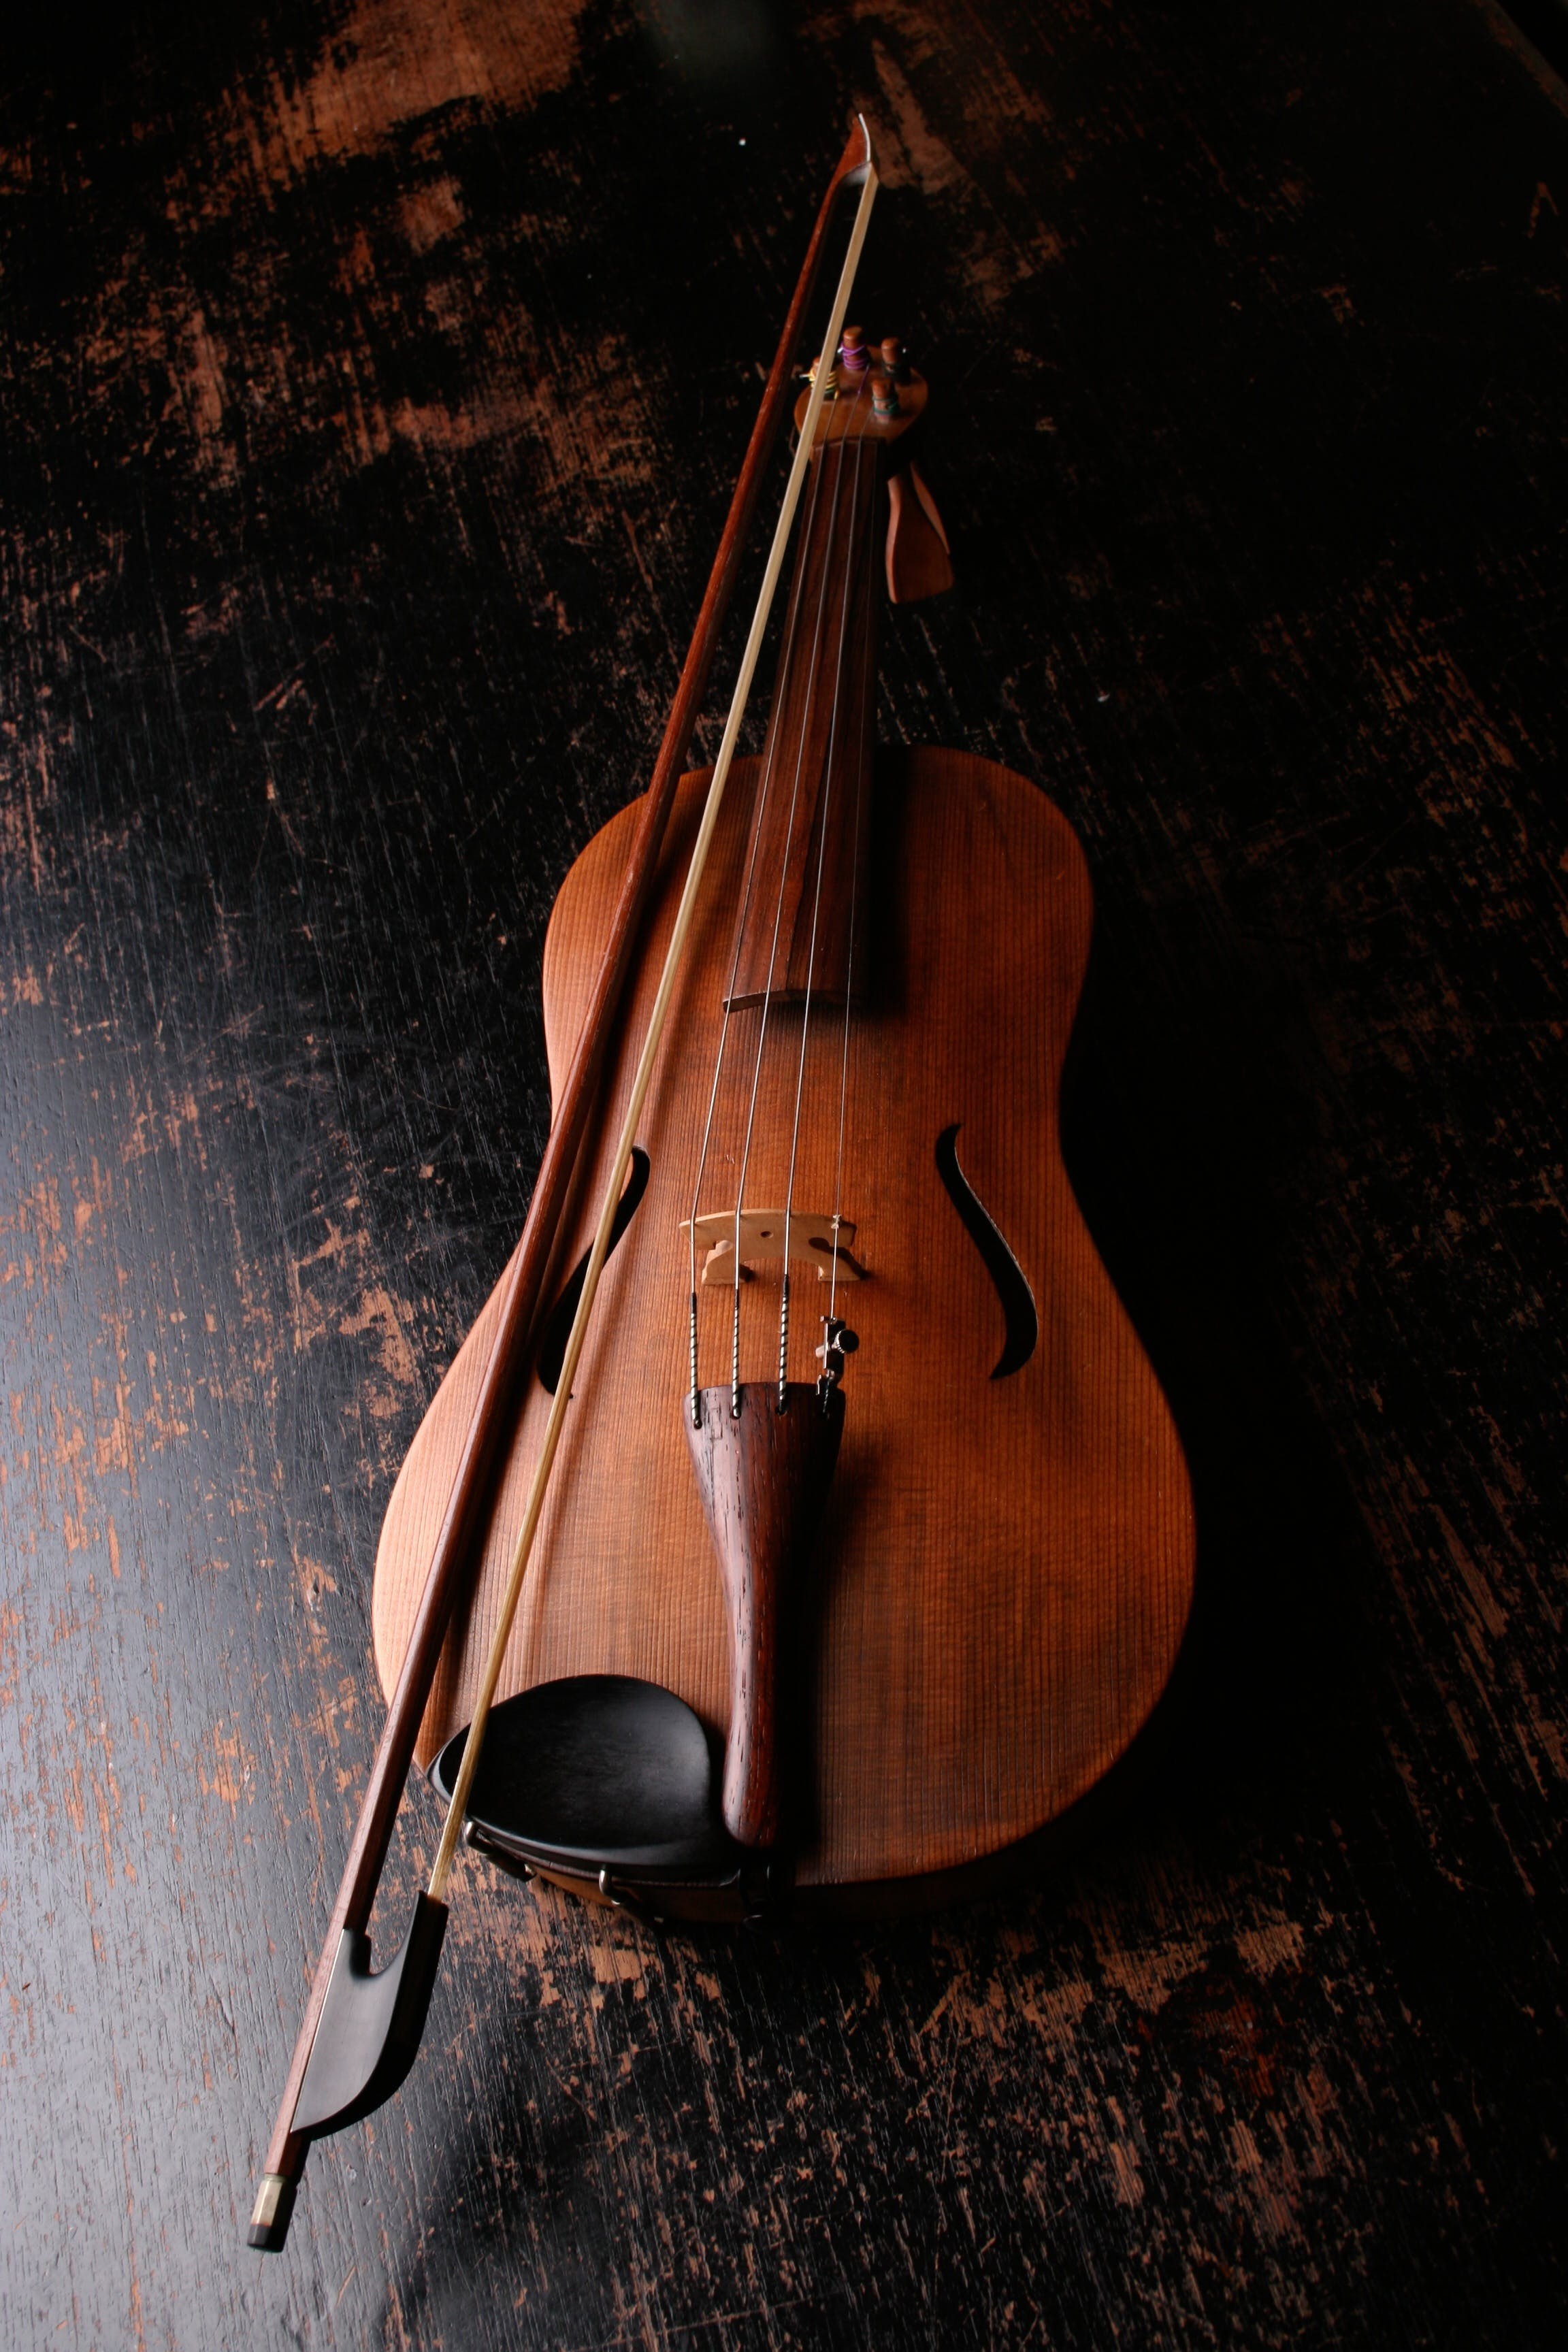 Brown Wooden Violin and Violin Bow